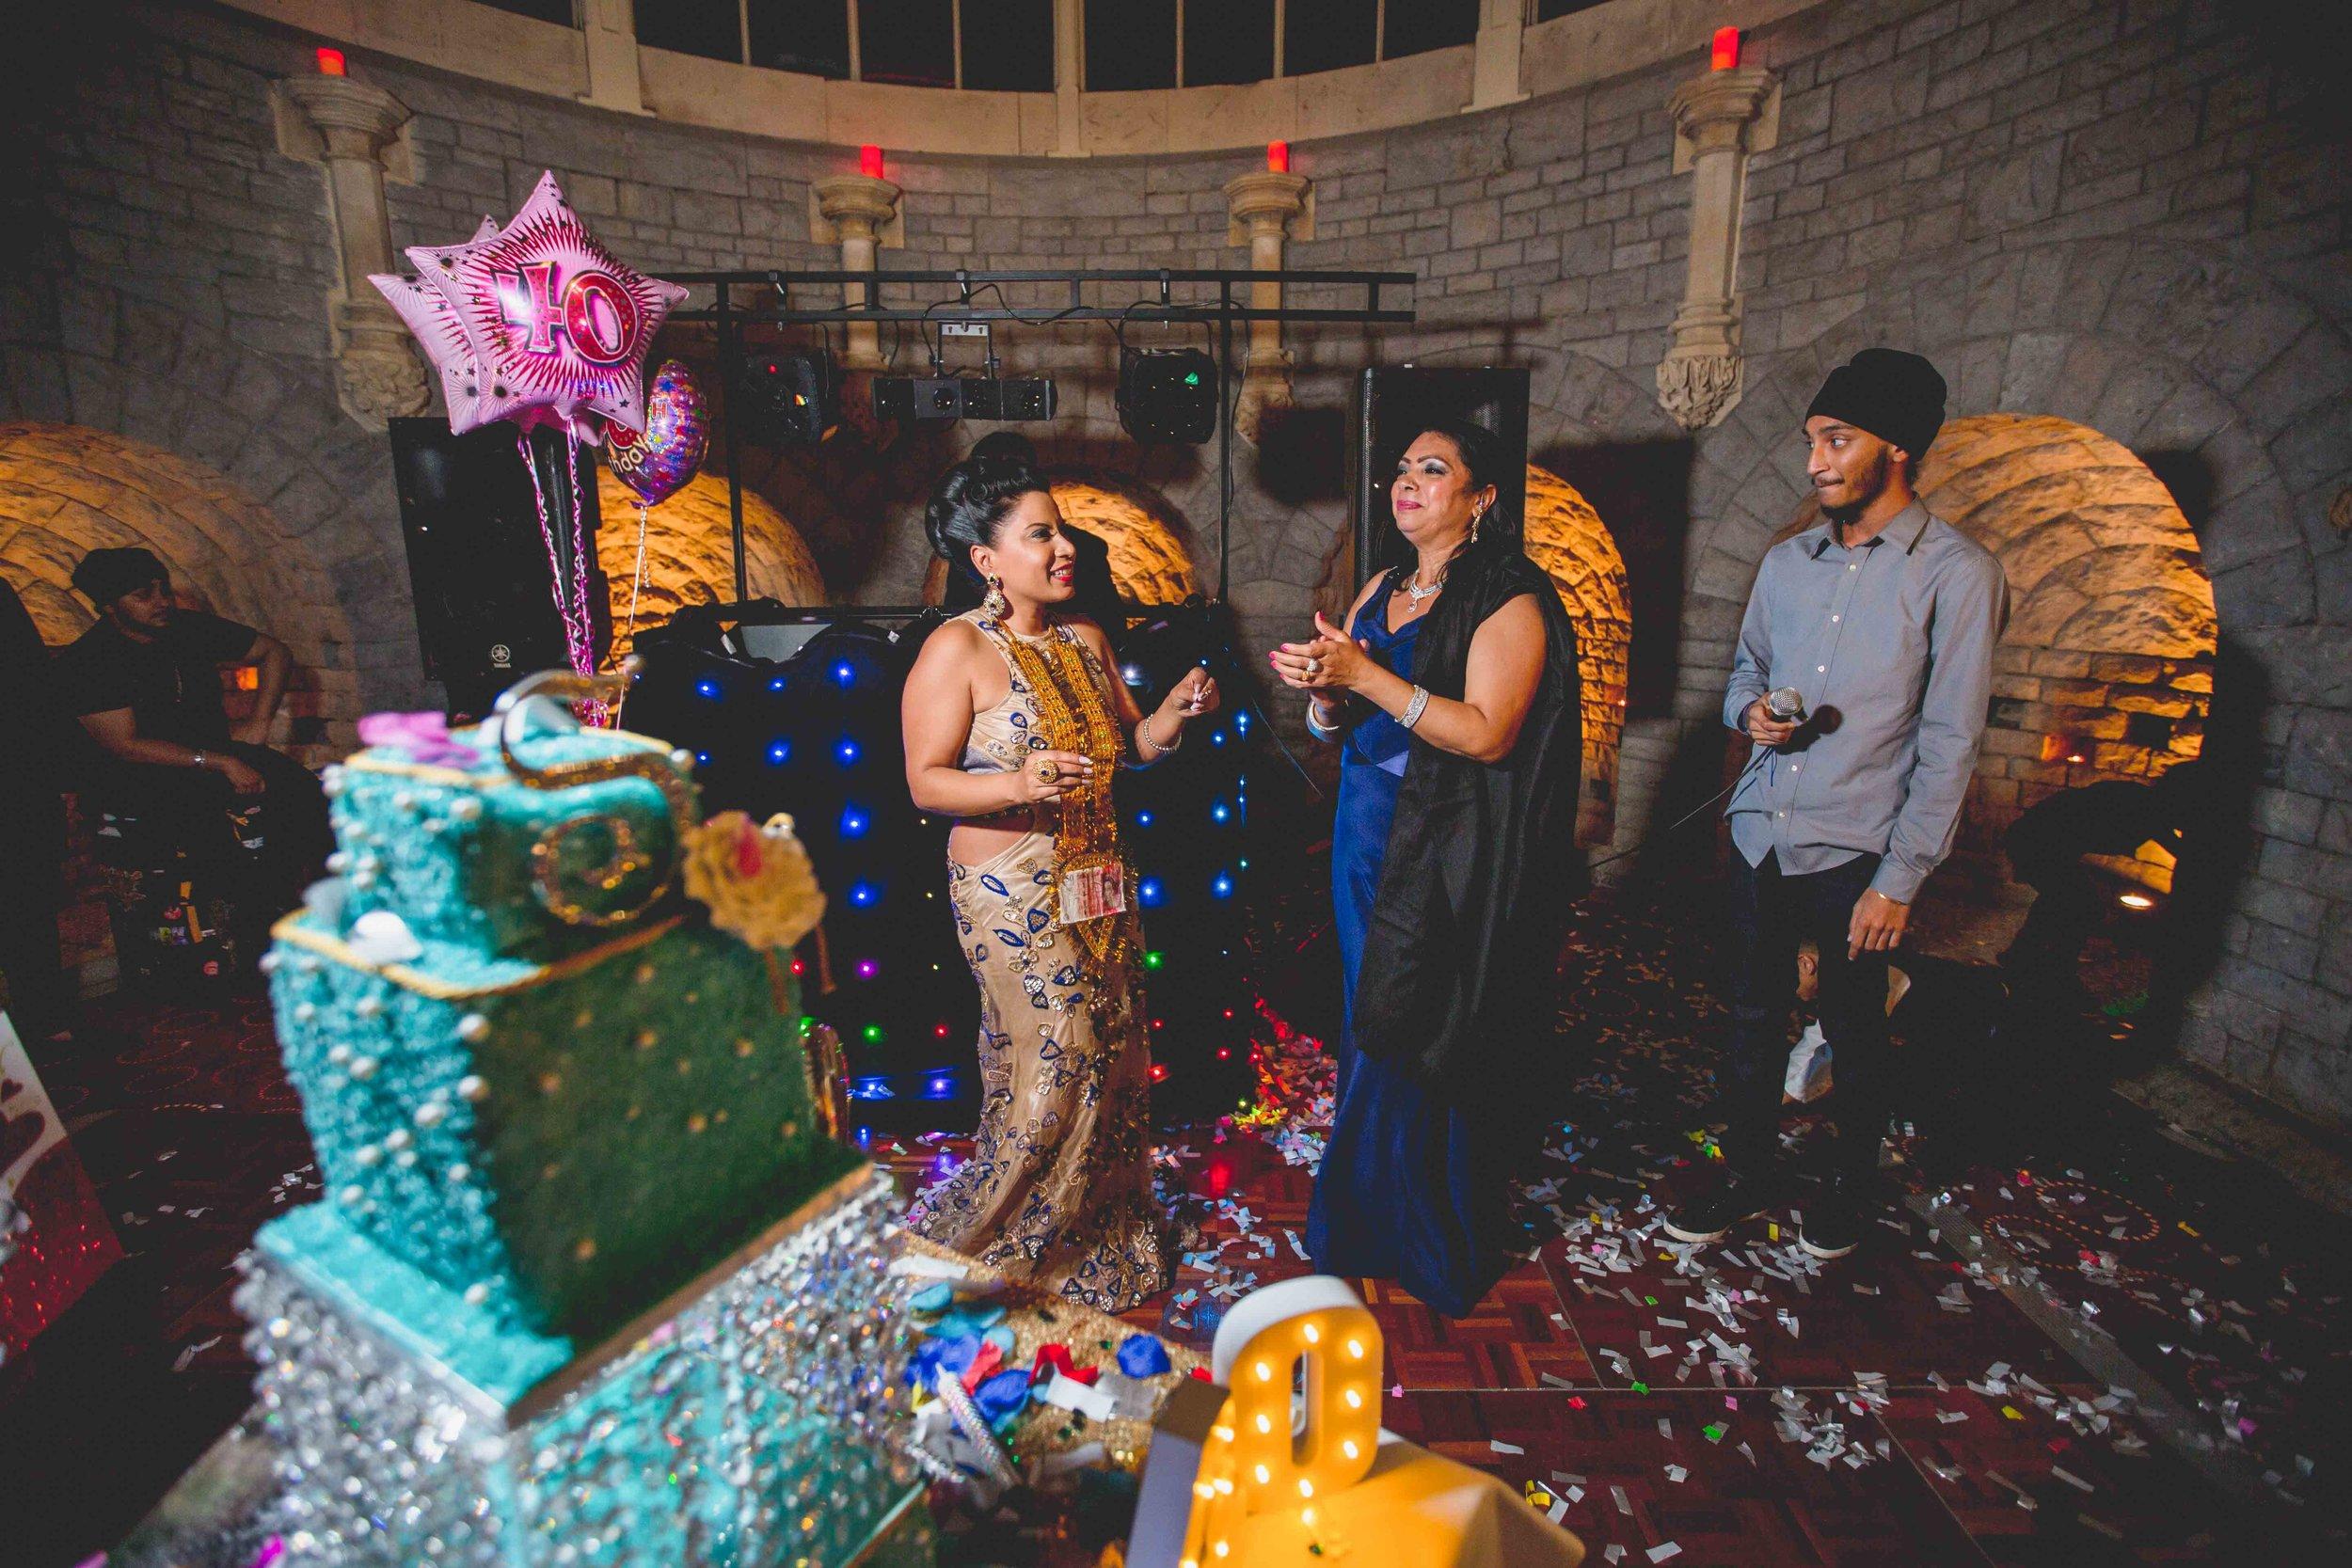 tortworth-Hotel-gloucester-birthday-wedding-photographer-natalia-smith-photography-31.jpg